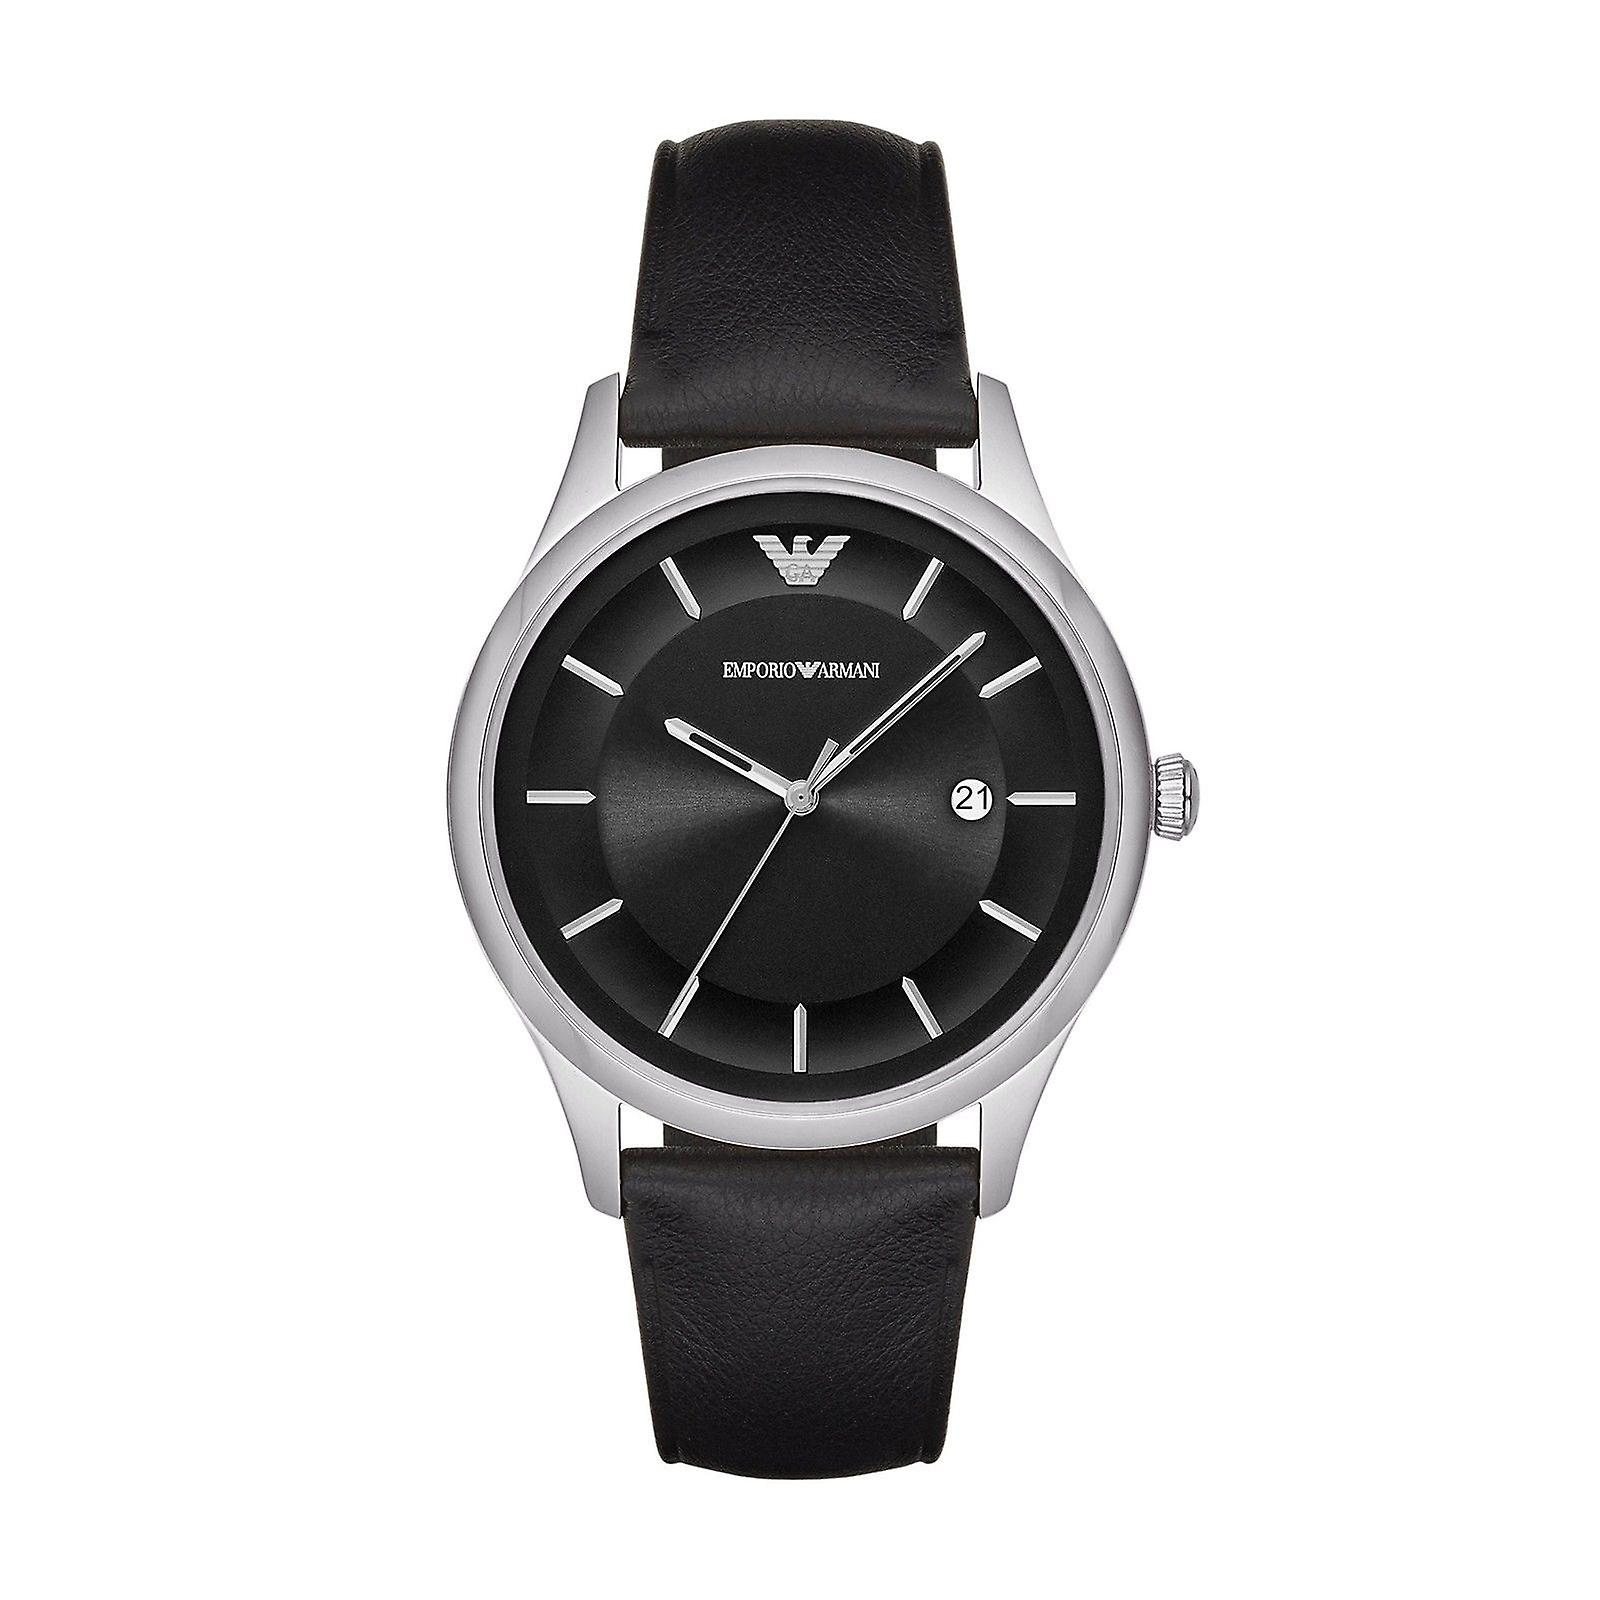 Emporio Armani Mens Gents montre bracelet de cuir noir cadran noir AR11020